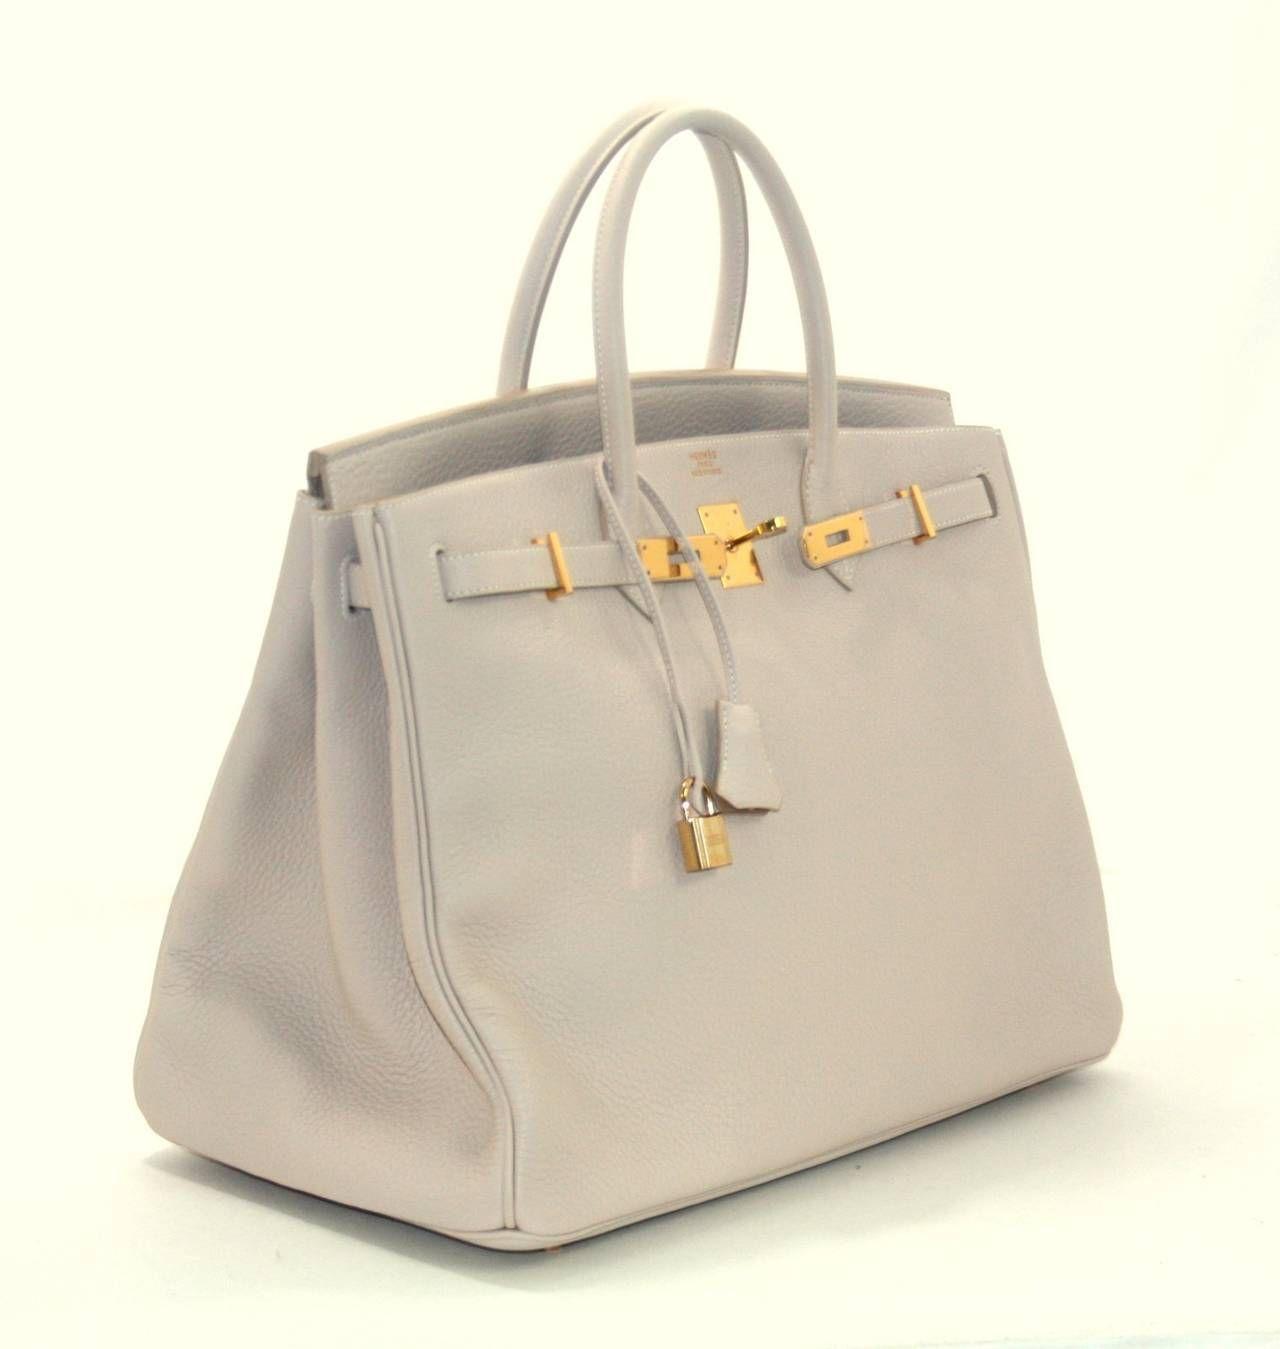 314affa4c8a6 Hermès Poudre Togo 40 cm Birkin Bag Gold HW image 3